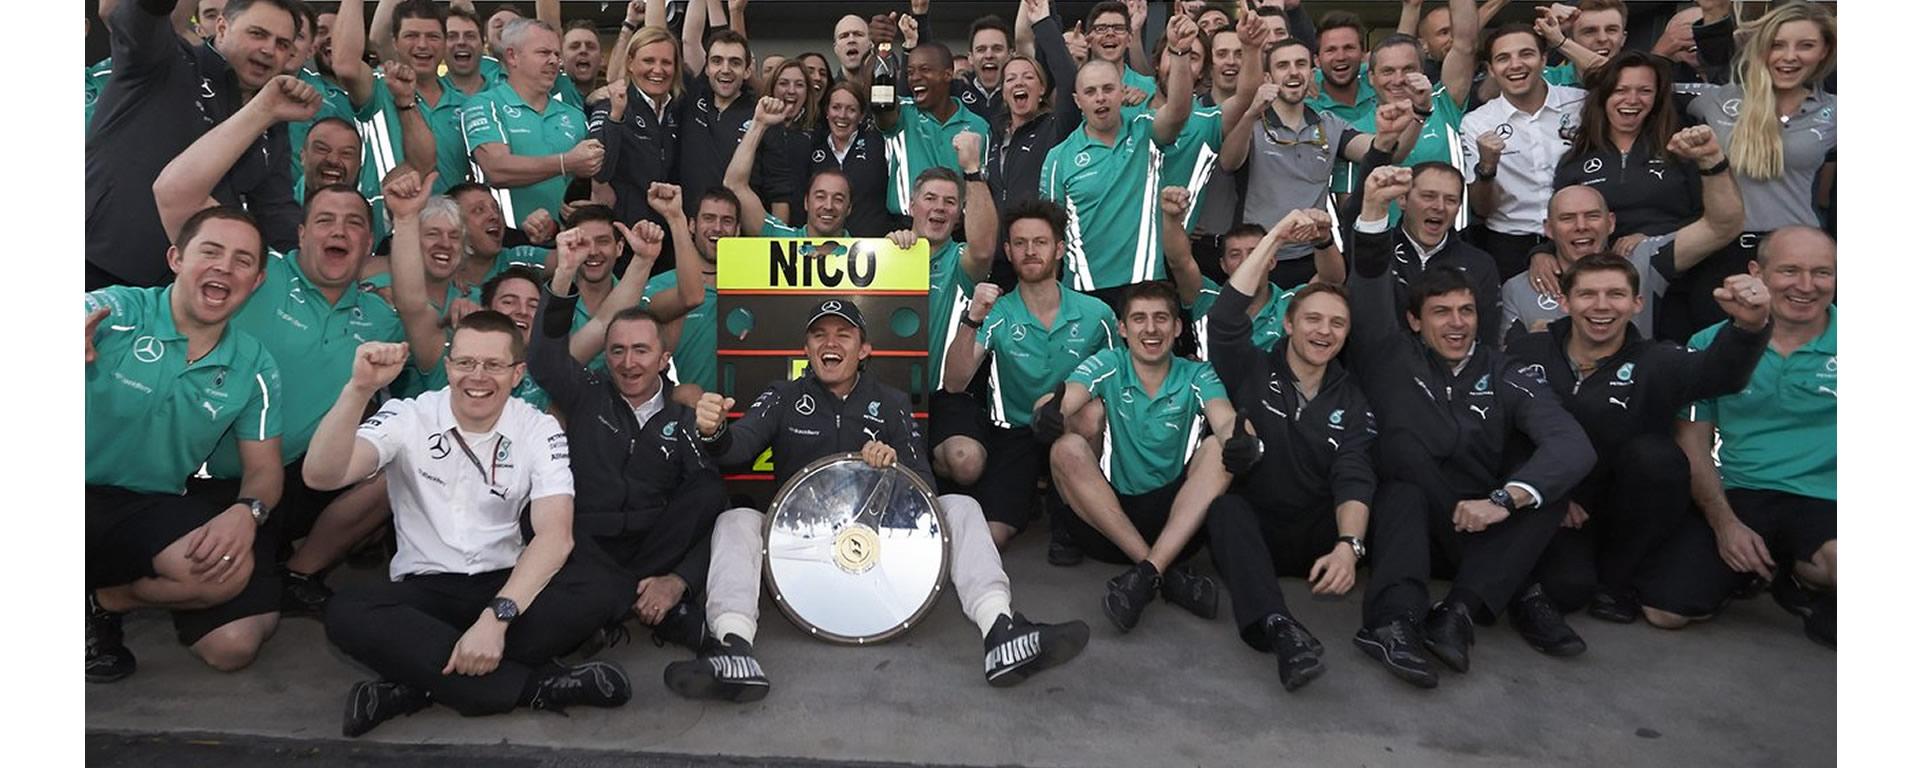 nico-win-3-16